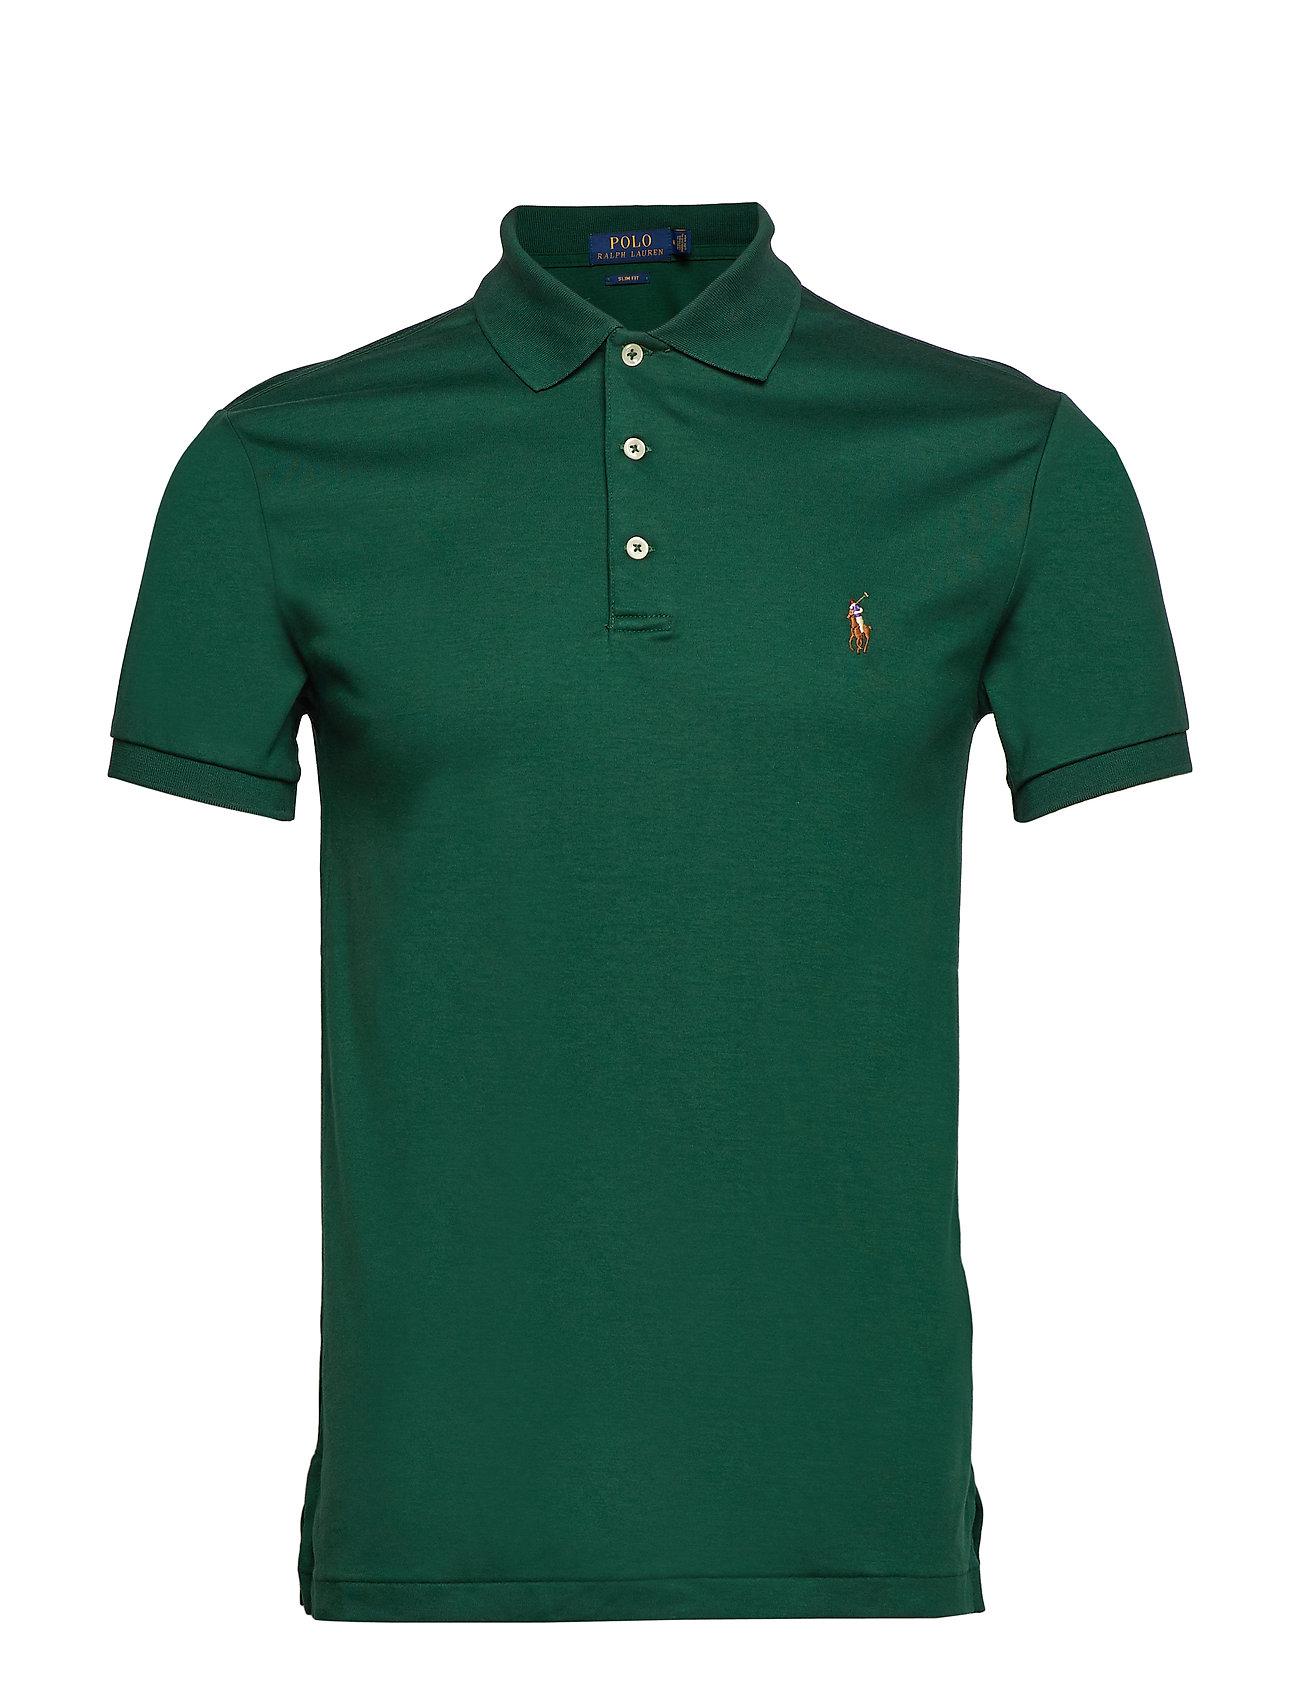 Polo Ralph Lauren Slim Fit Soft-Touch Polo Shirt